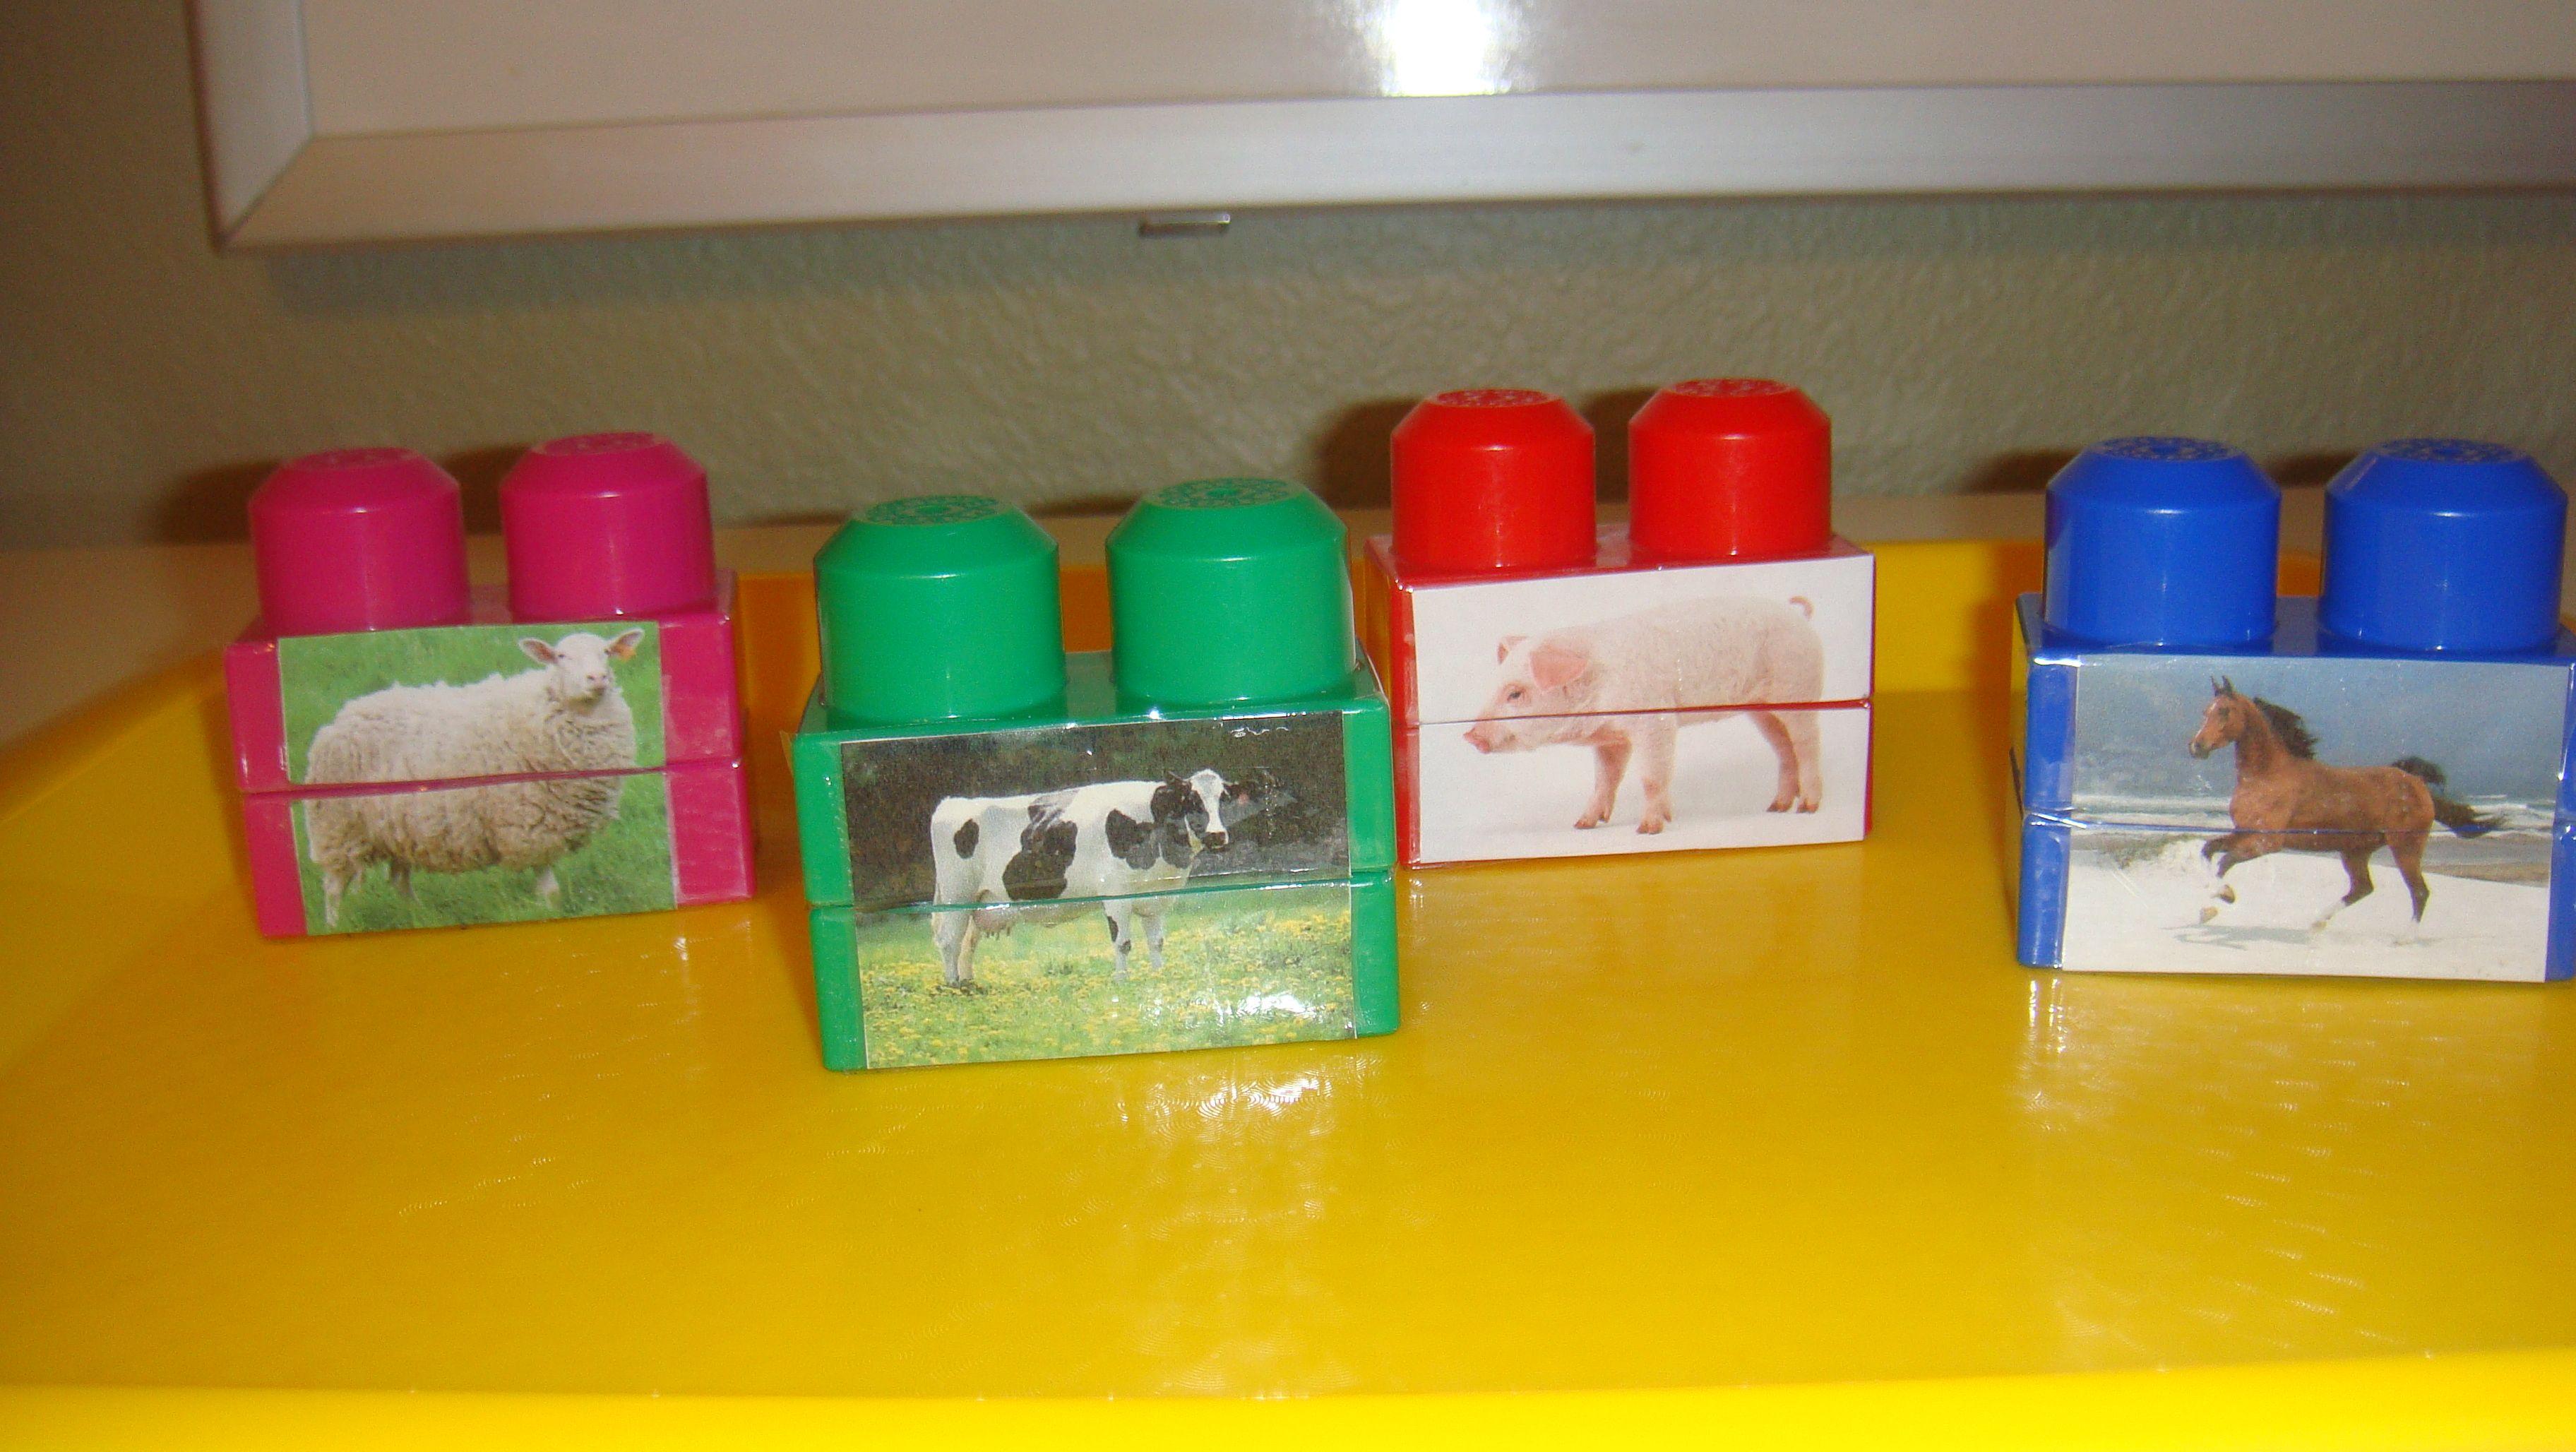 Toddler School Tray 70: Animal Matching Tops and Bottoms on Mega Blocks